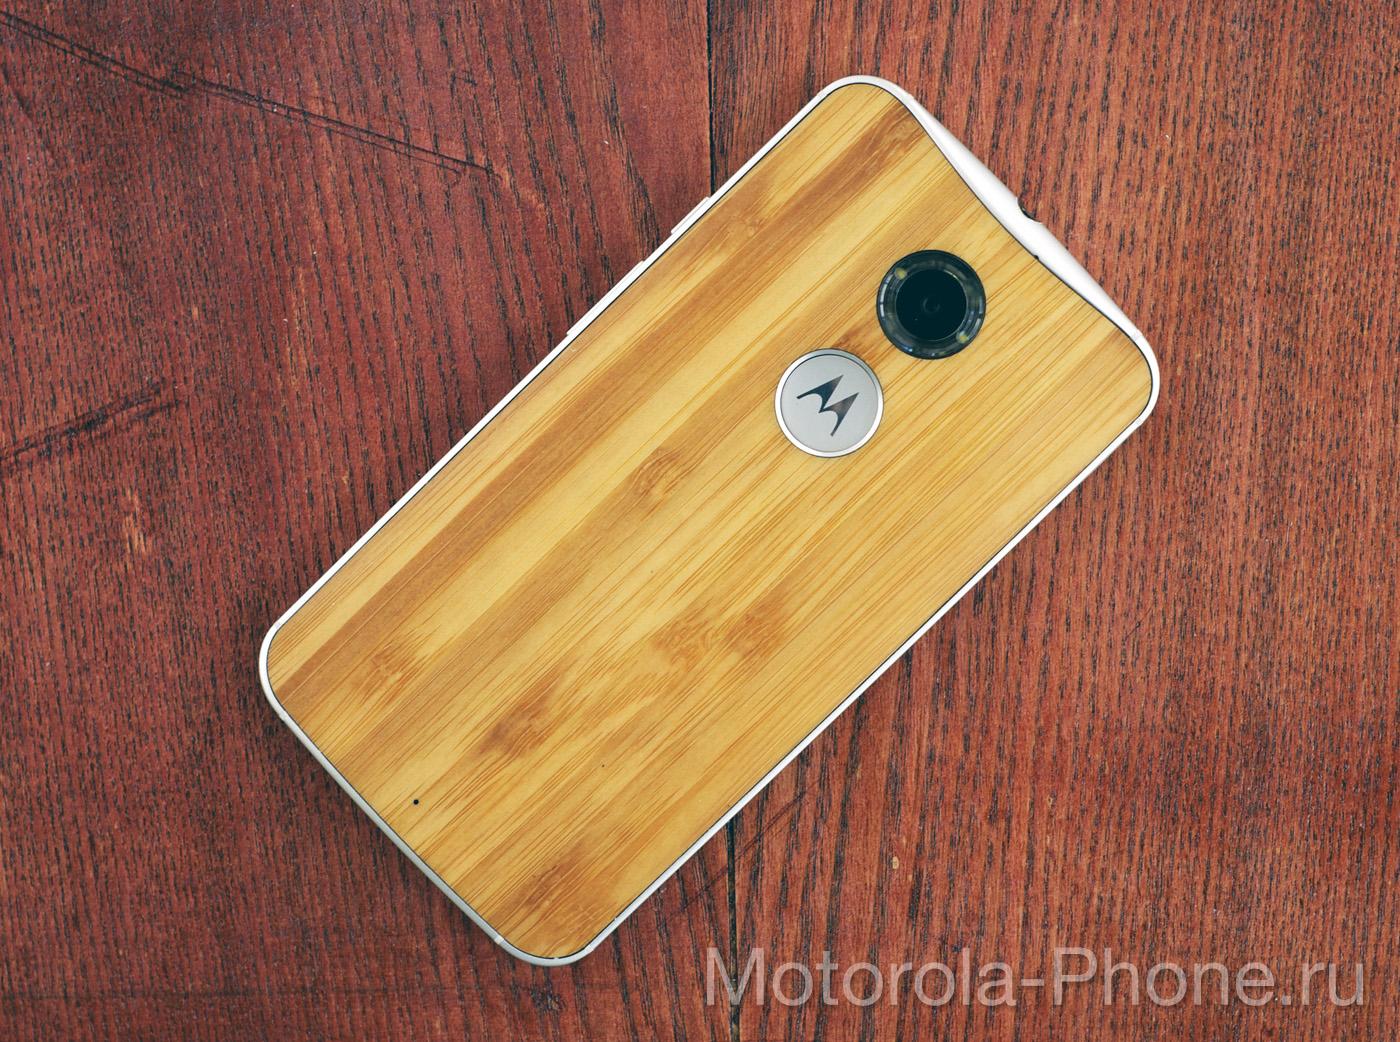 Motorola-Moto-X-04